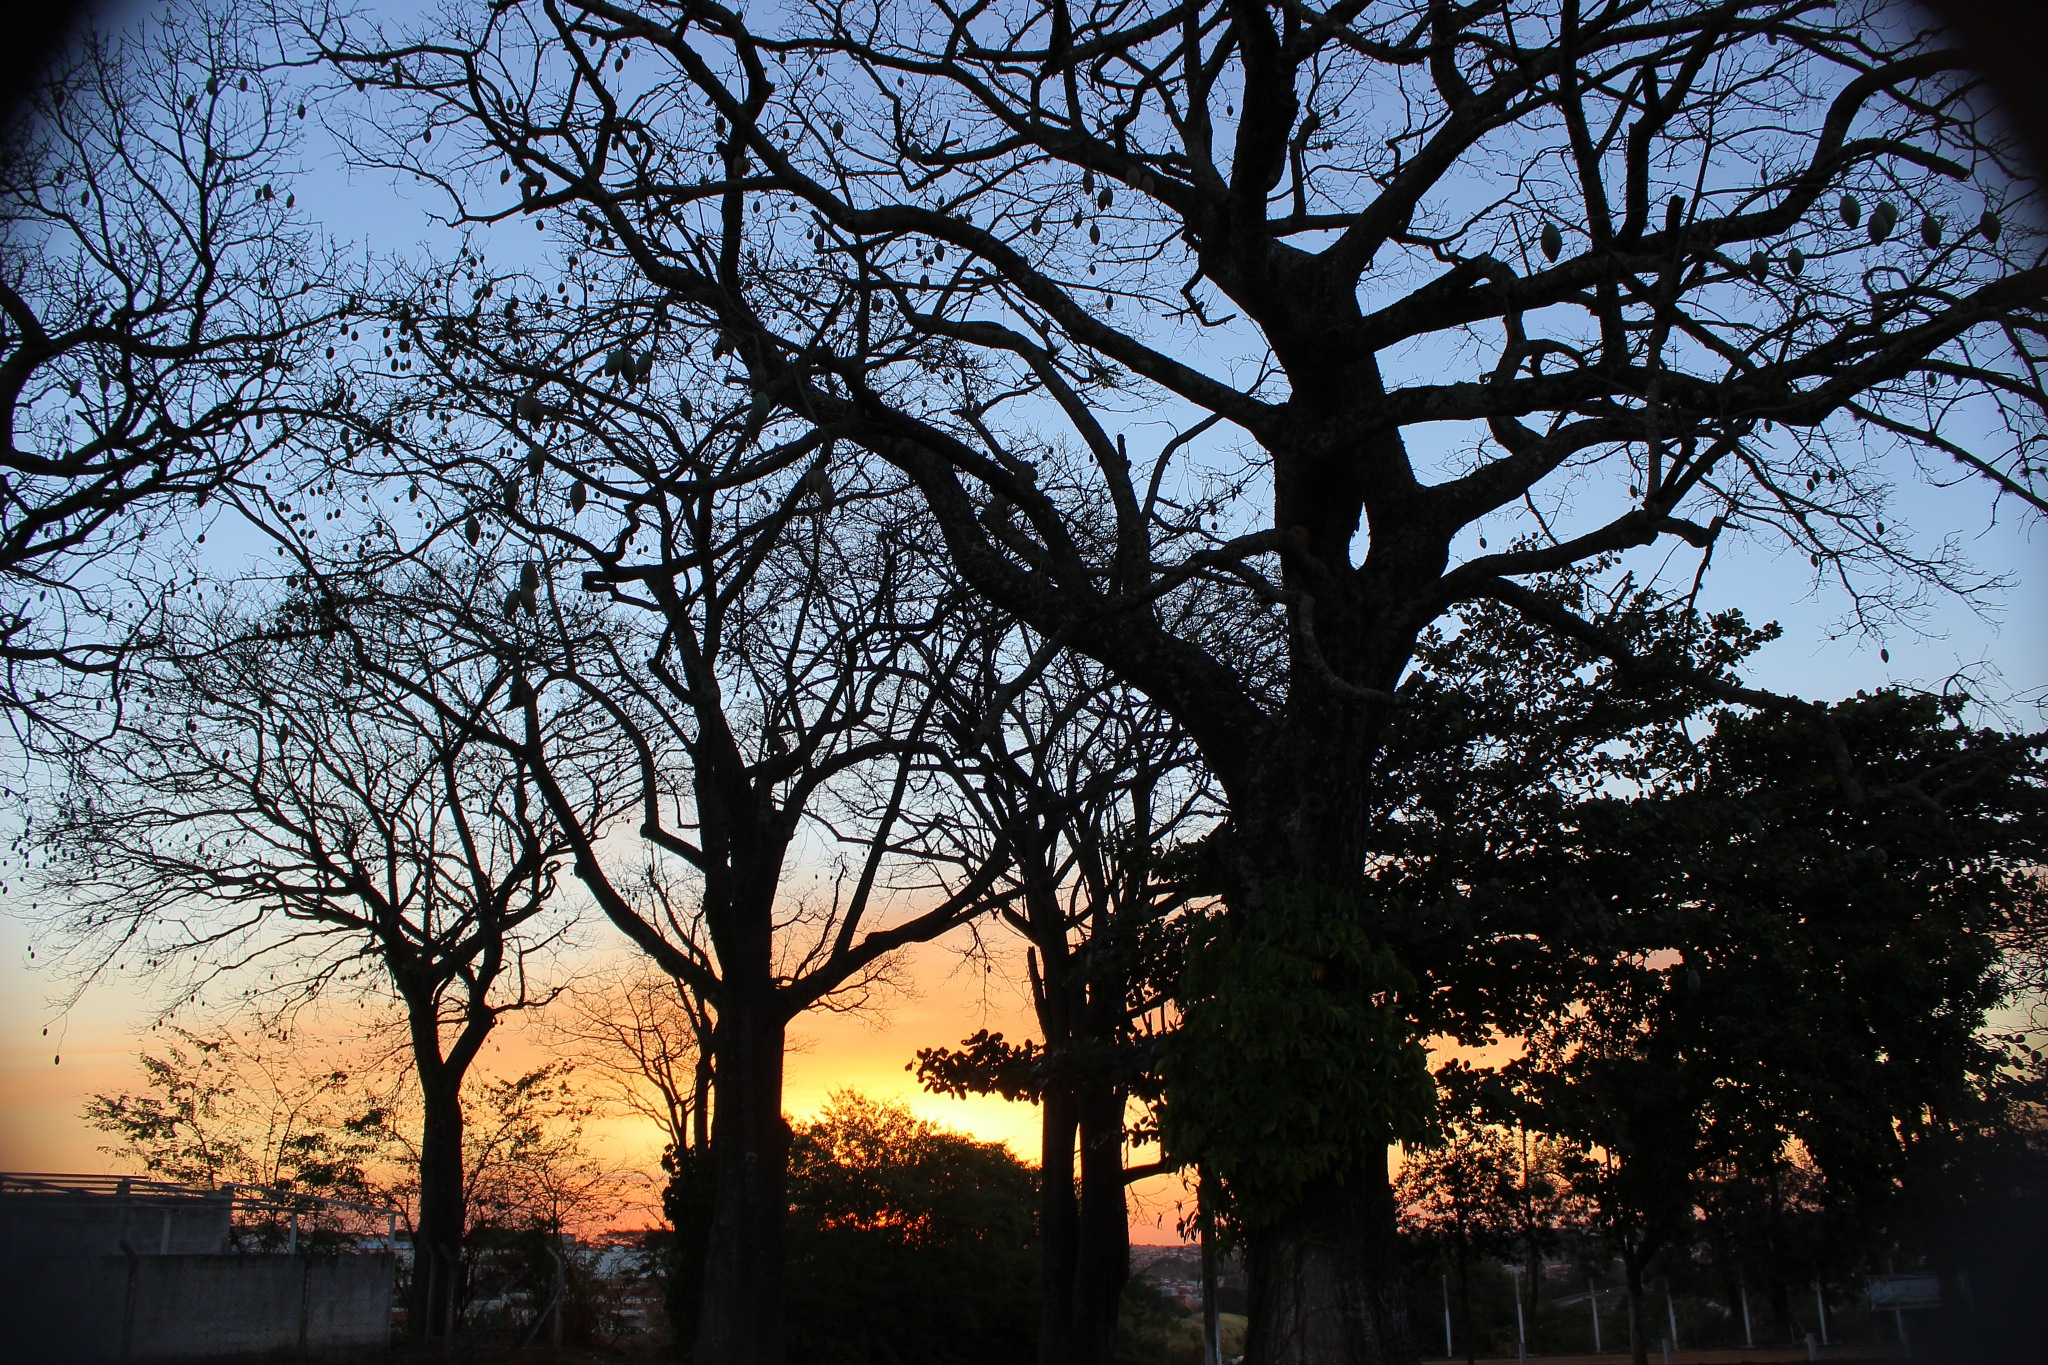 Sunset trees  by andreantoniofelipe